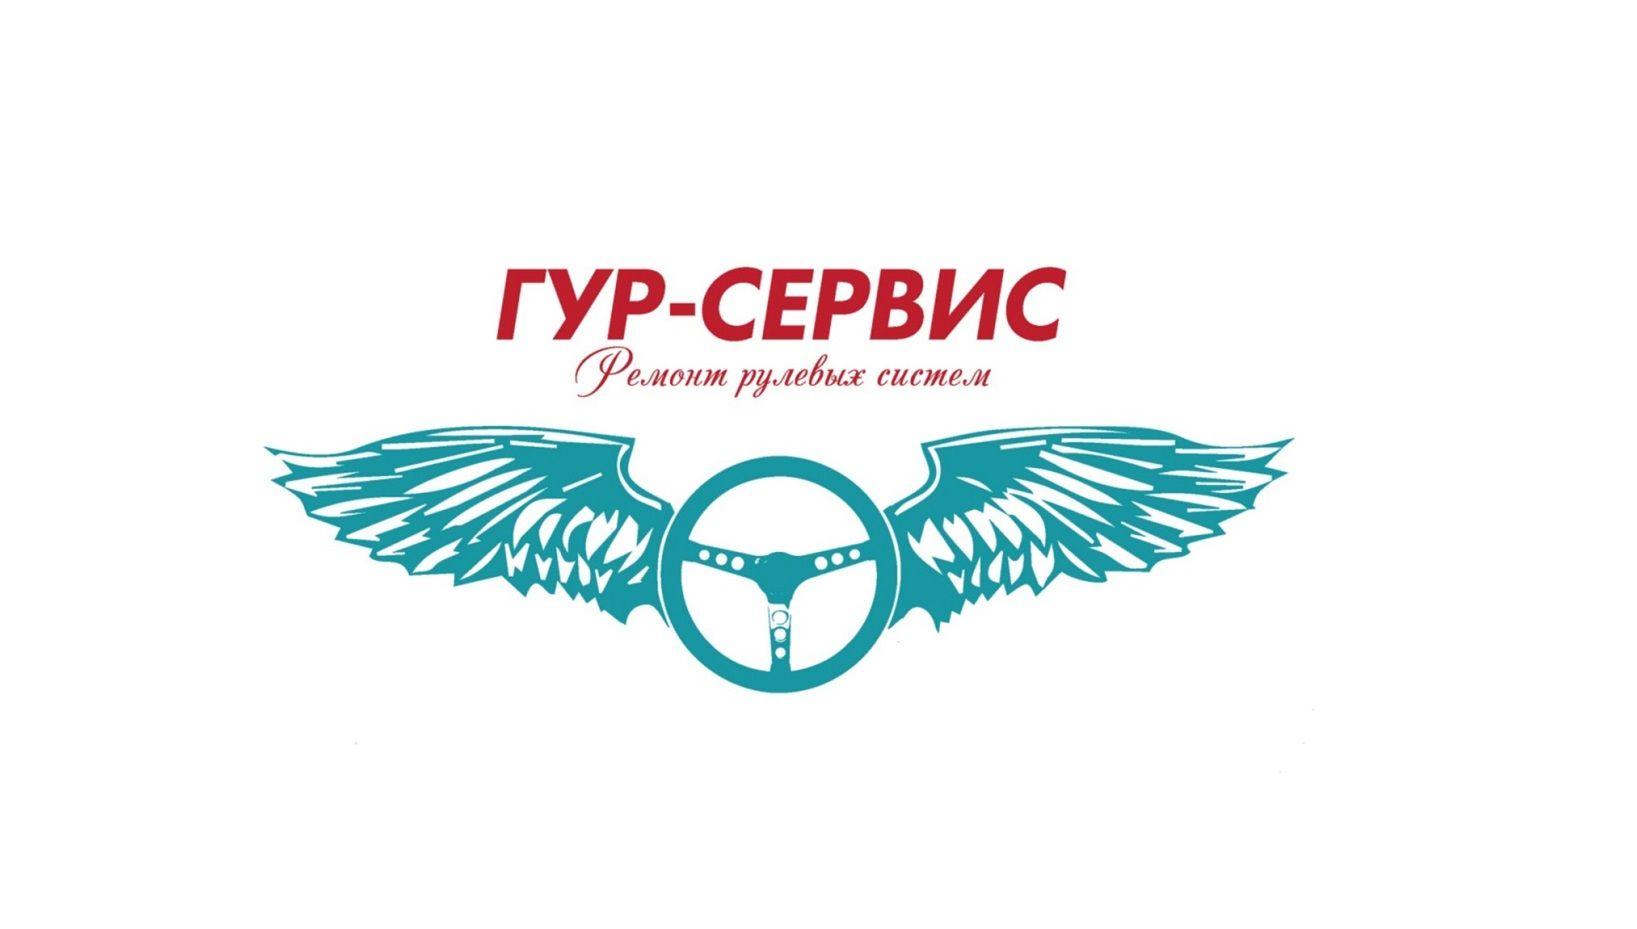 Логотип для ГУР-СЕРВИС - дизайнер Virtuoz9891